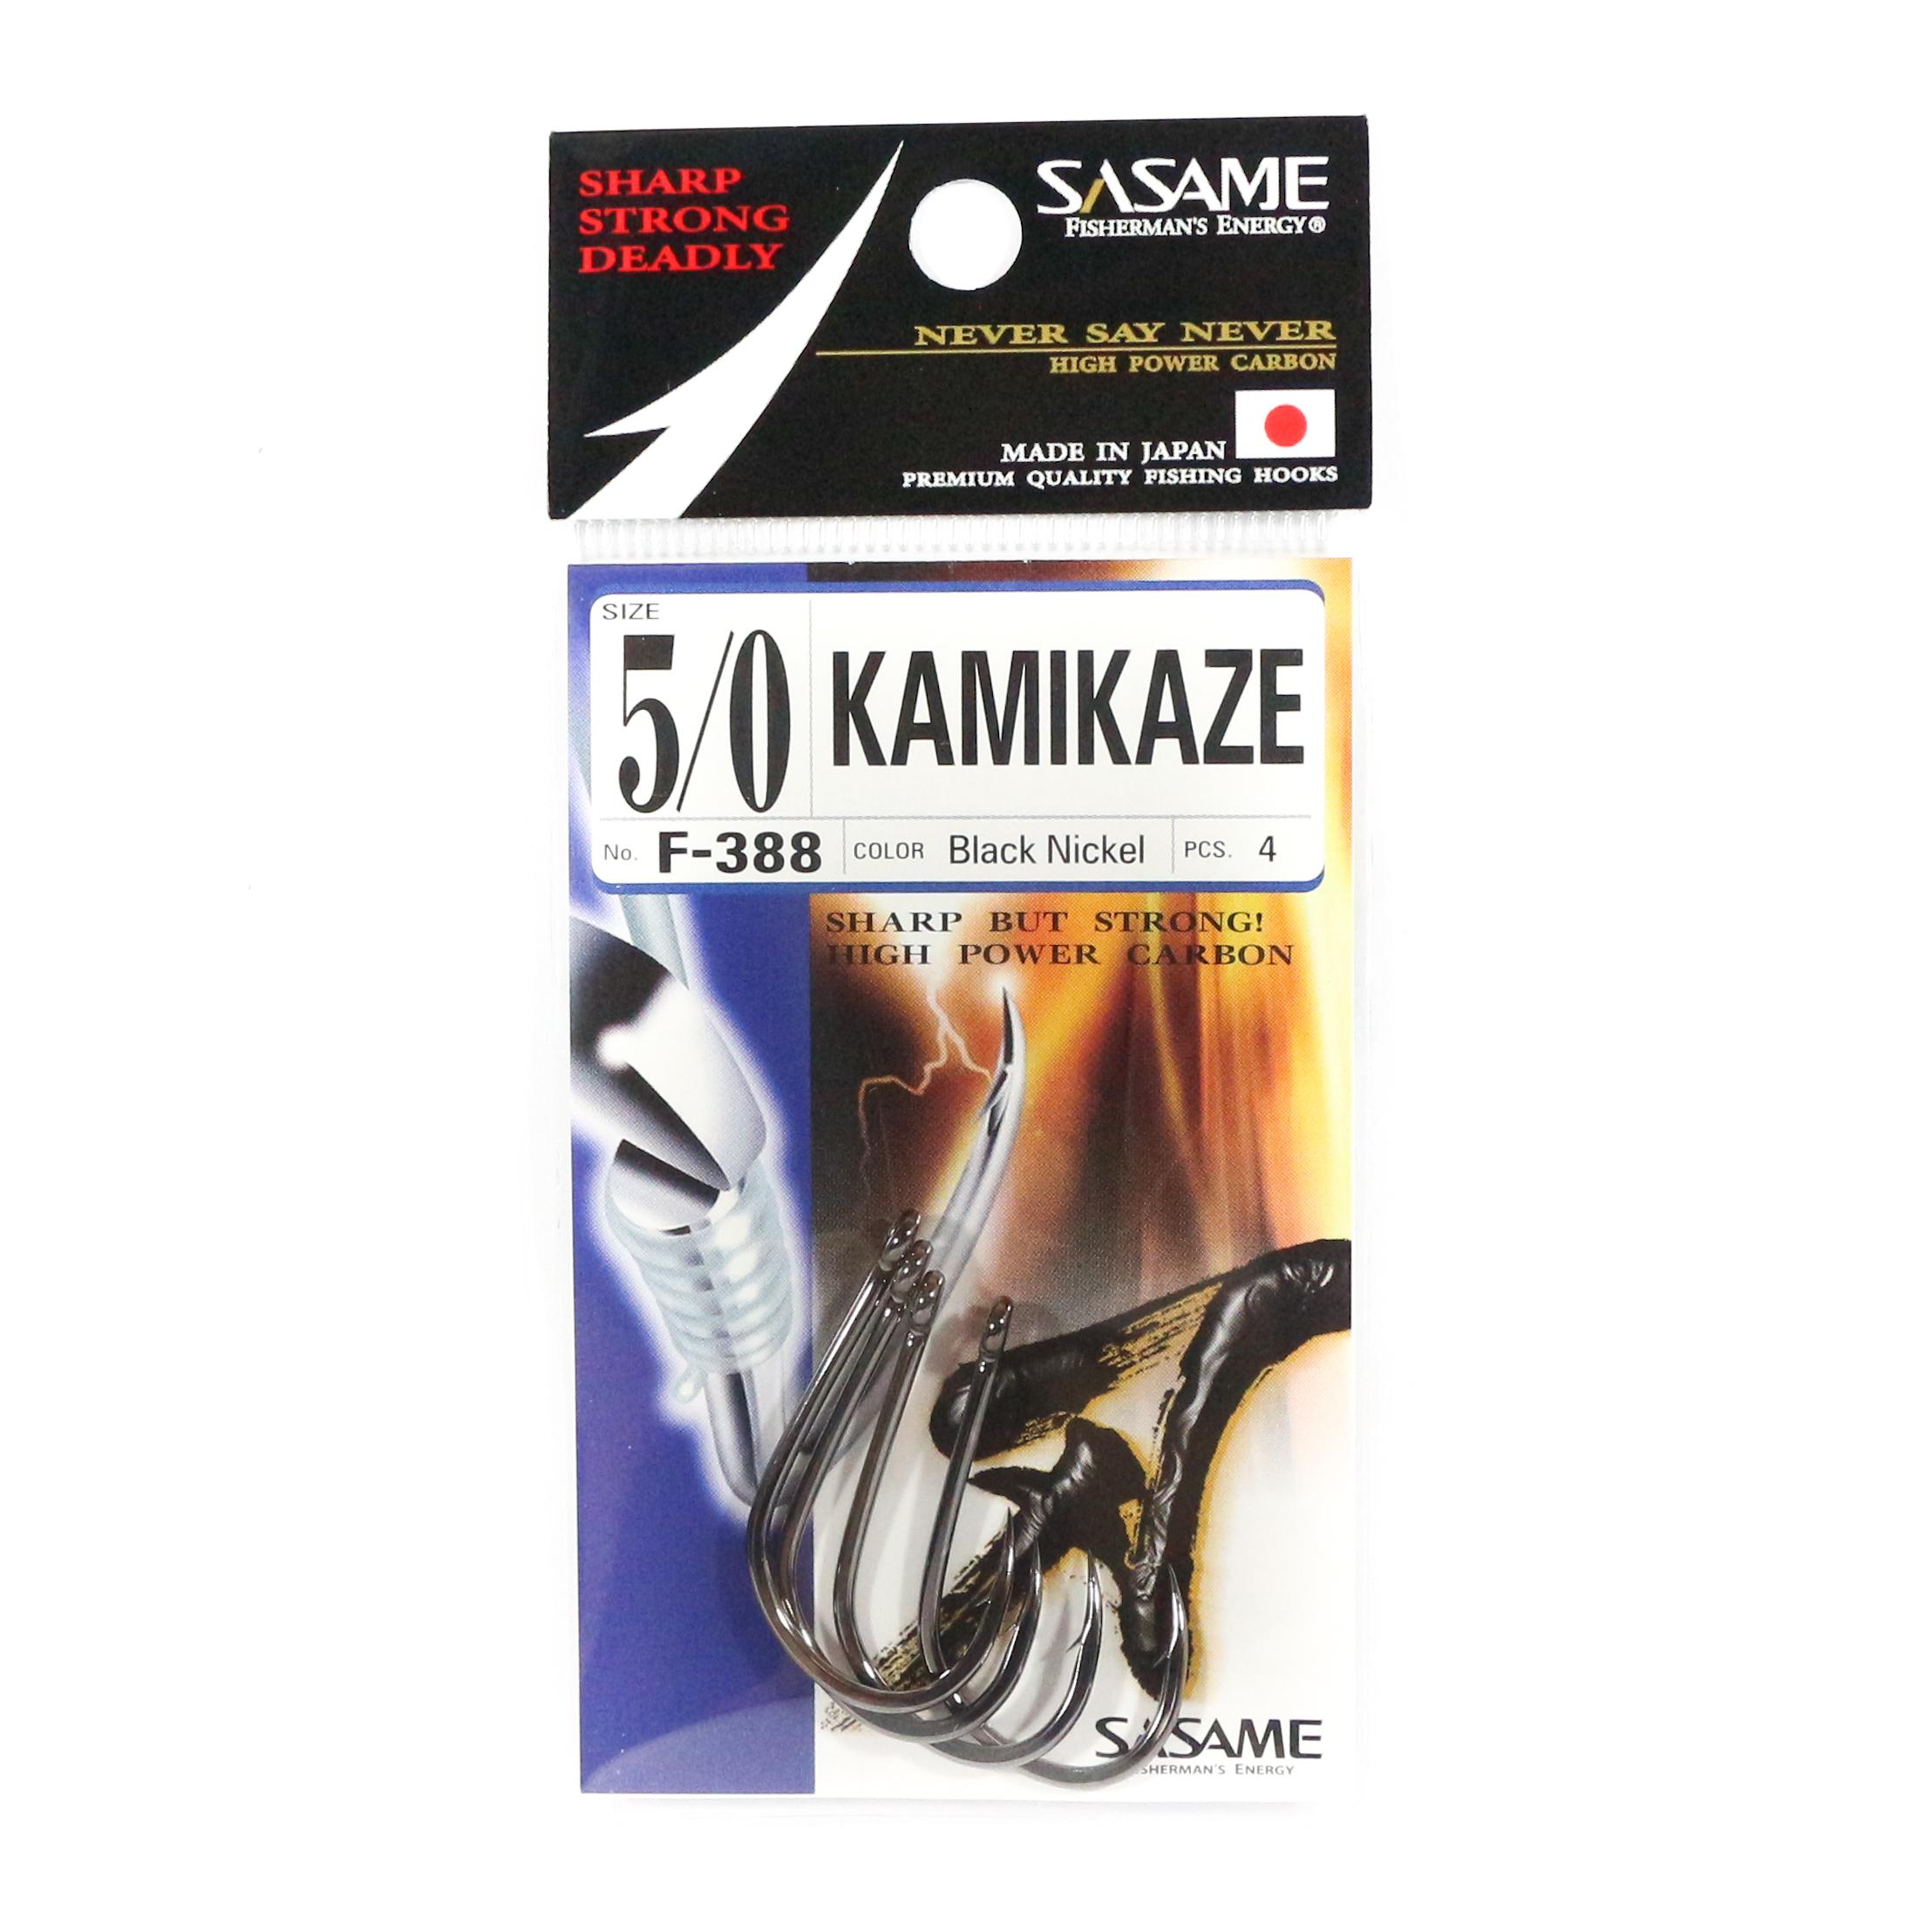 Sasame F-388 Kamikaze Straight Shank Offset Hook Size 5/0 (4835)